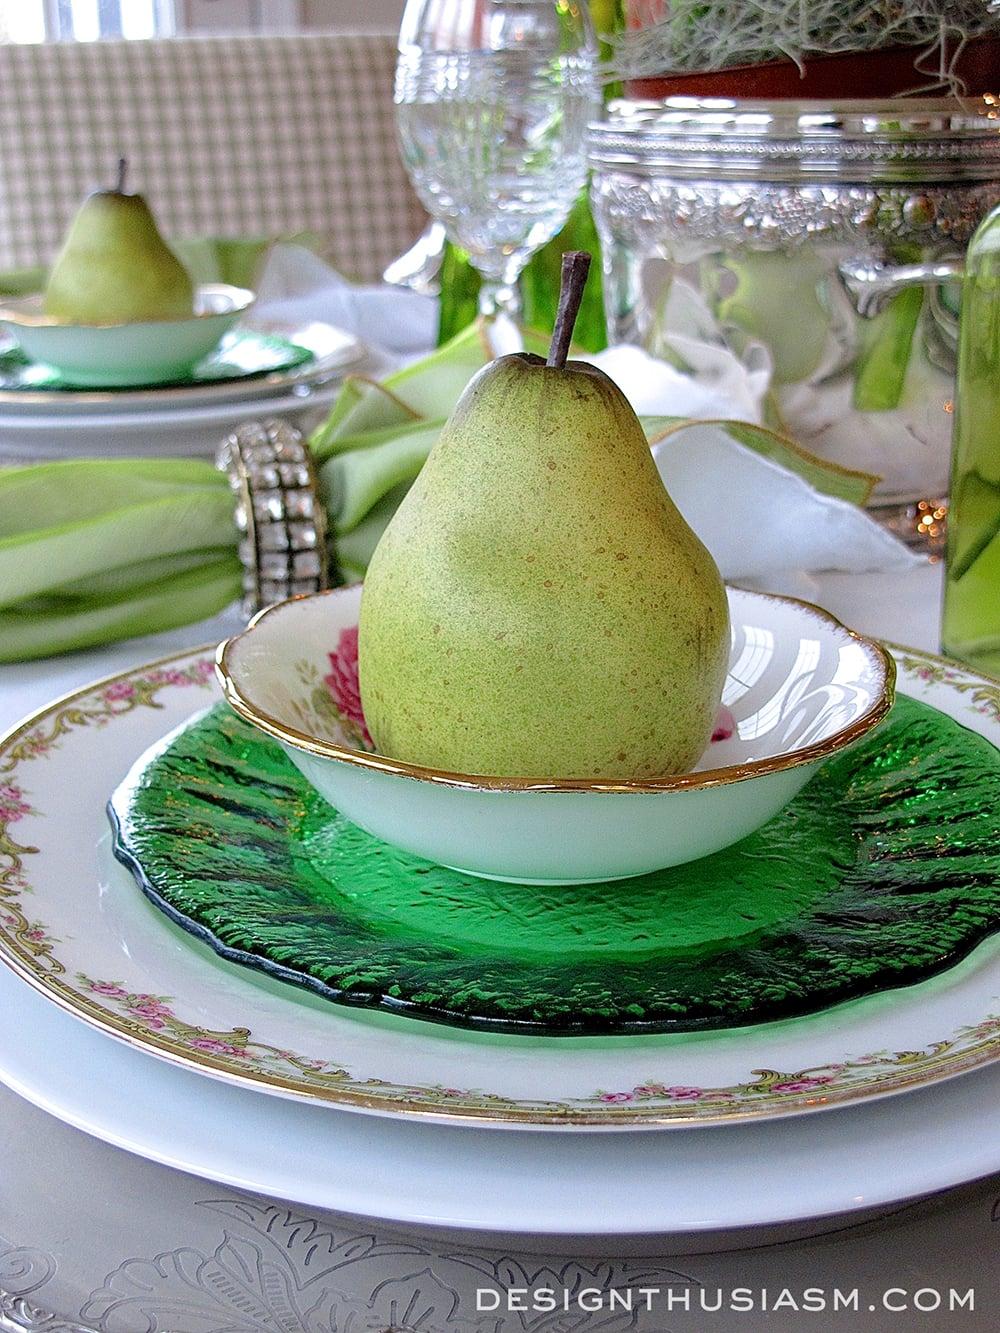 An Elegant St. Patrick's Day Tablescape - Designthusiasm.com